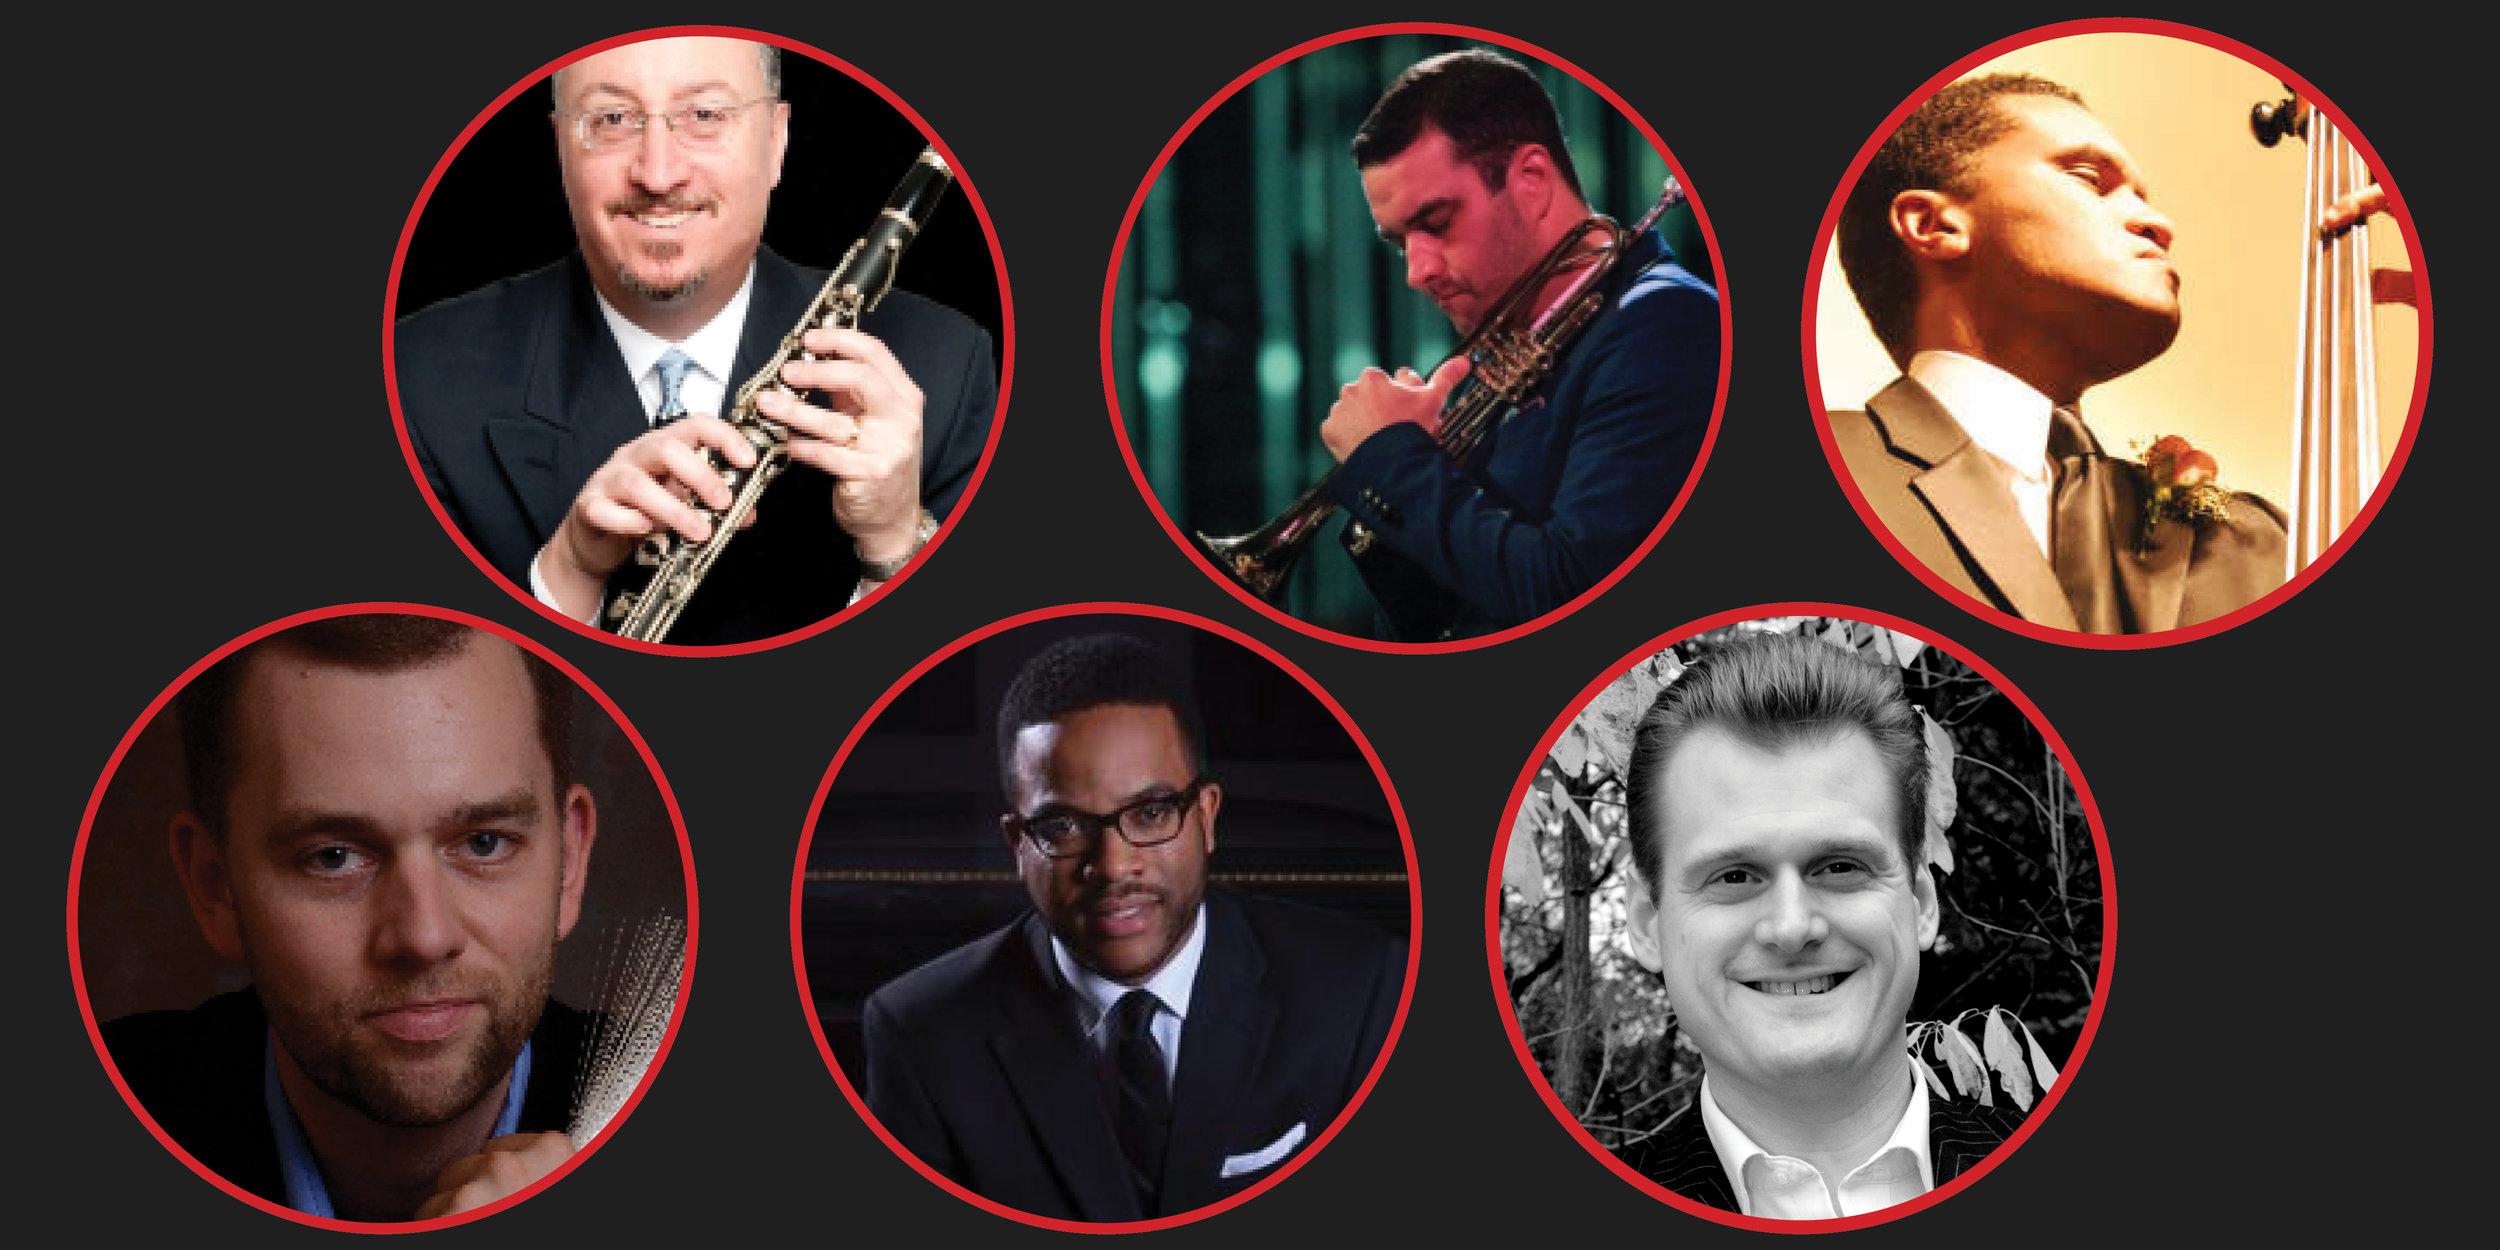 Paul Cosentino, Jeff Bush, Paul Thompson, Thomas Wendt, Alton Merrell, Jeff Bush